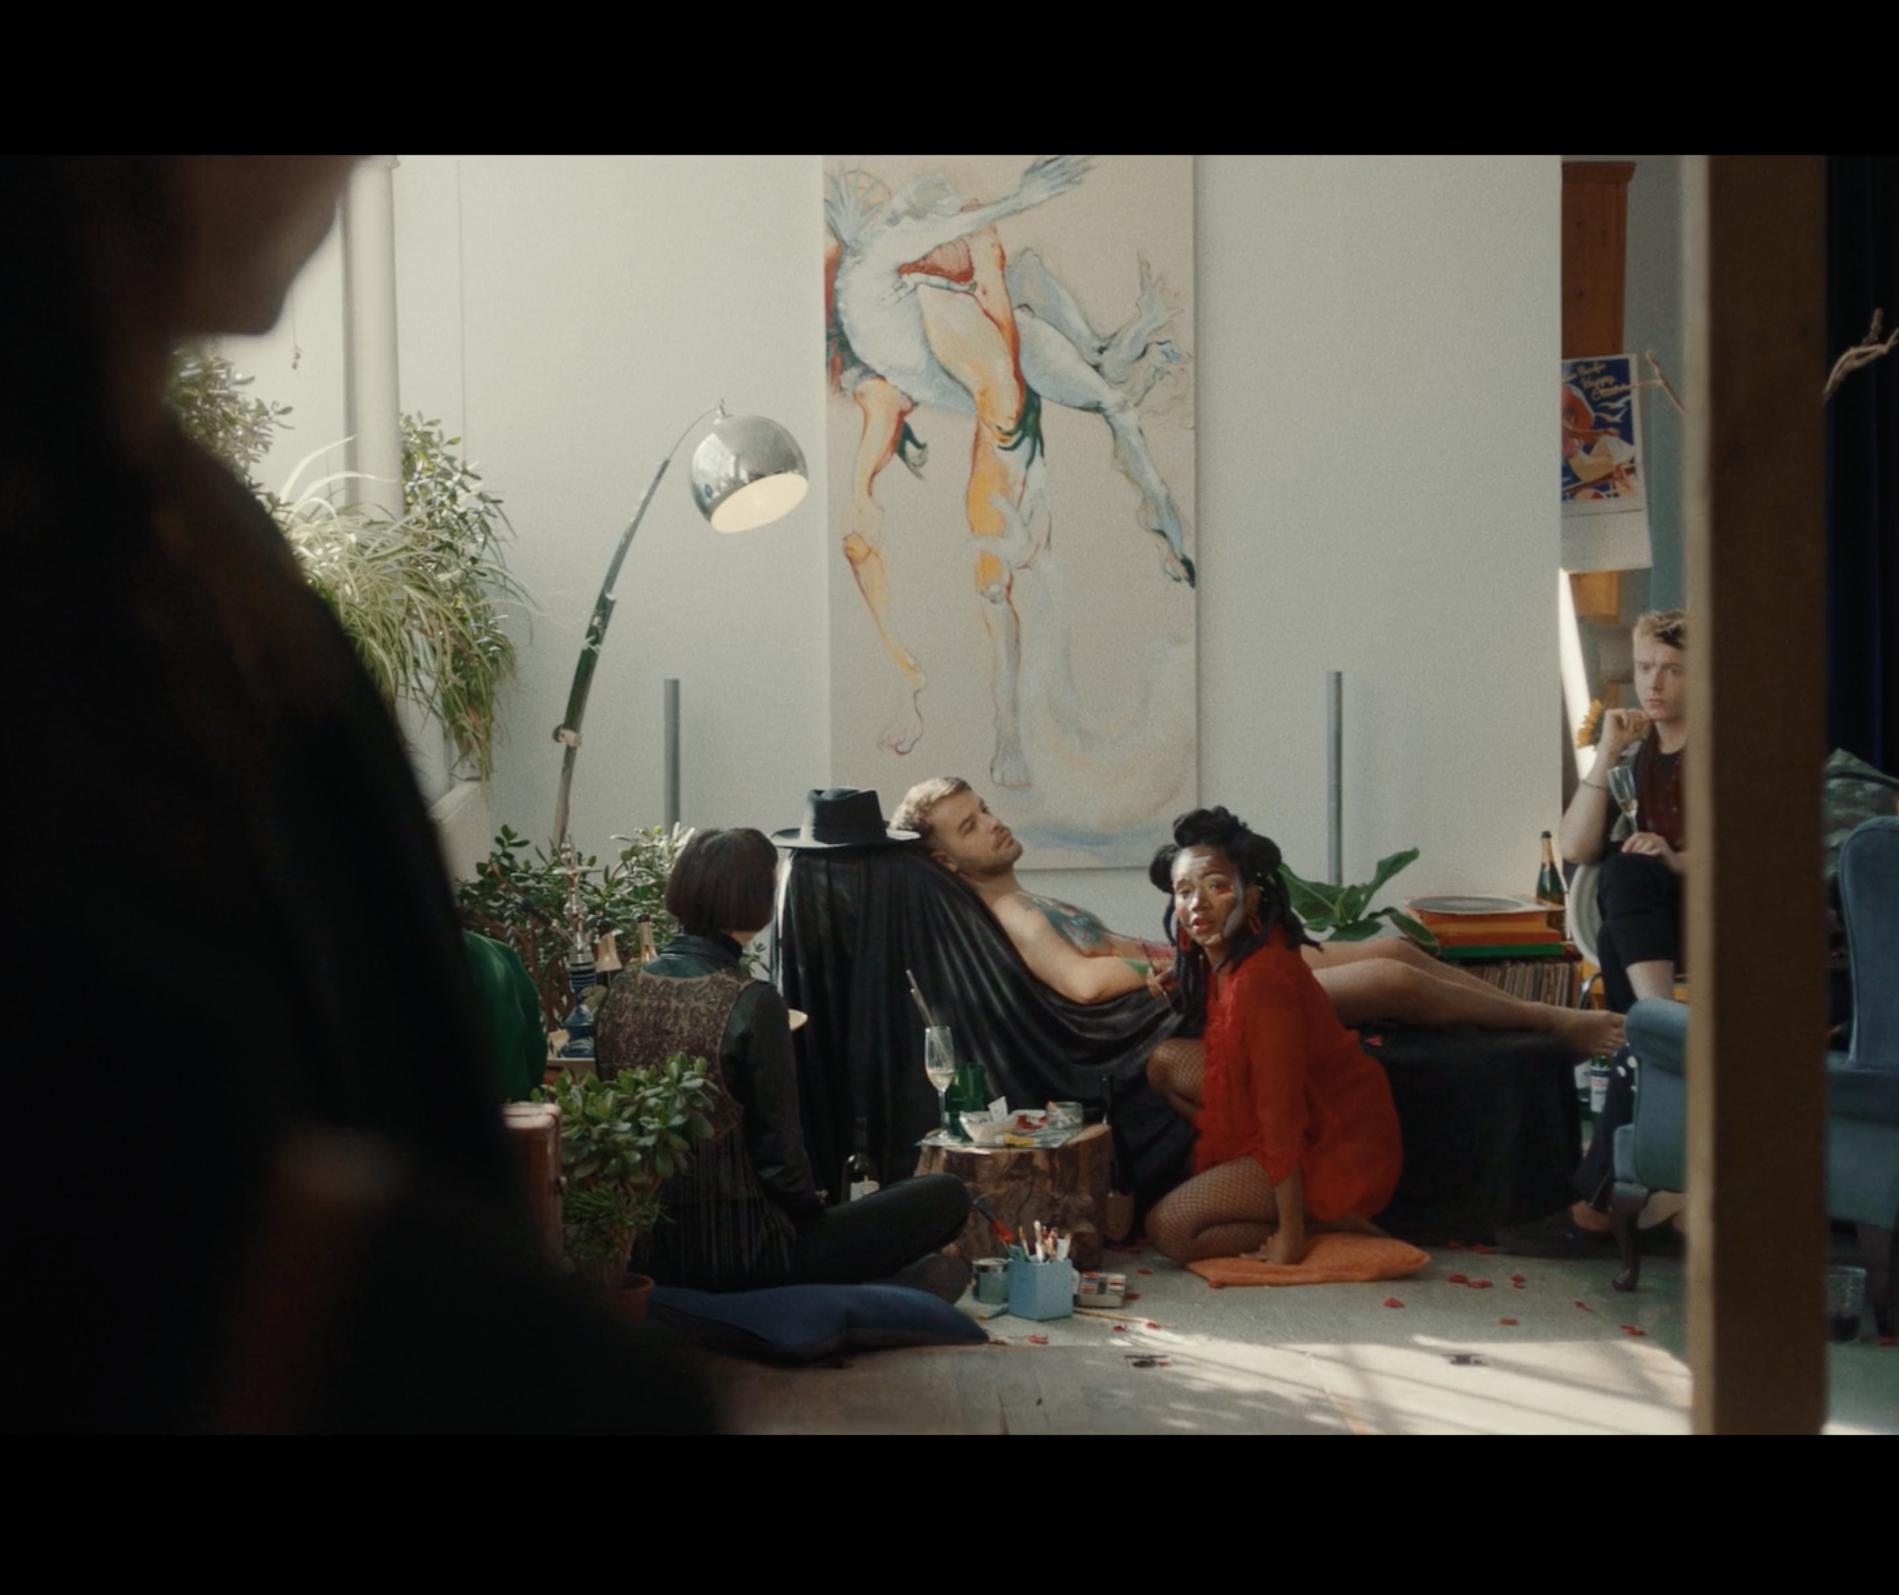 'Slap' on the set of 'Pineapple'